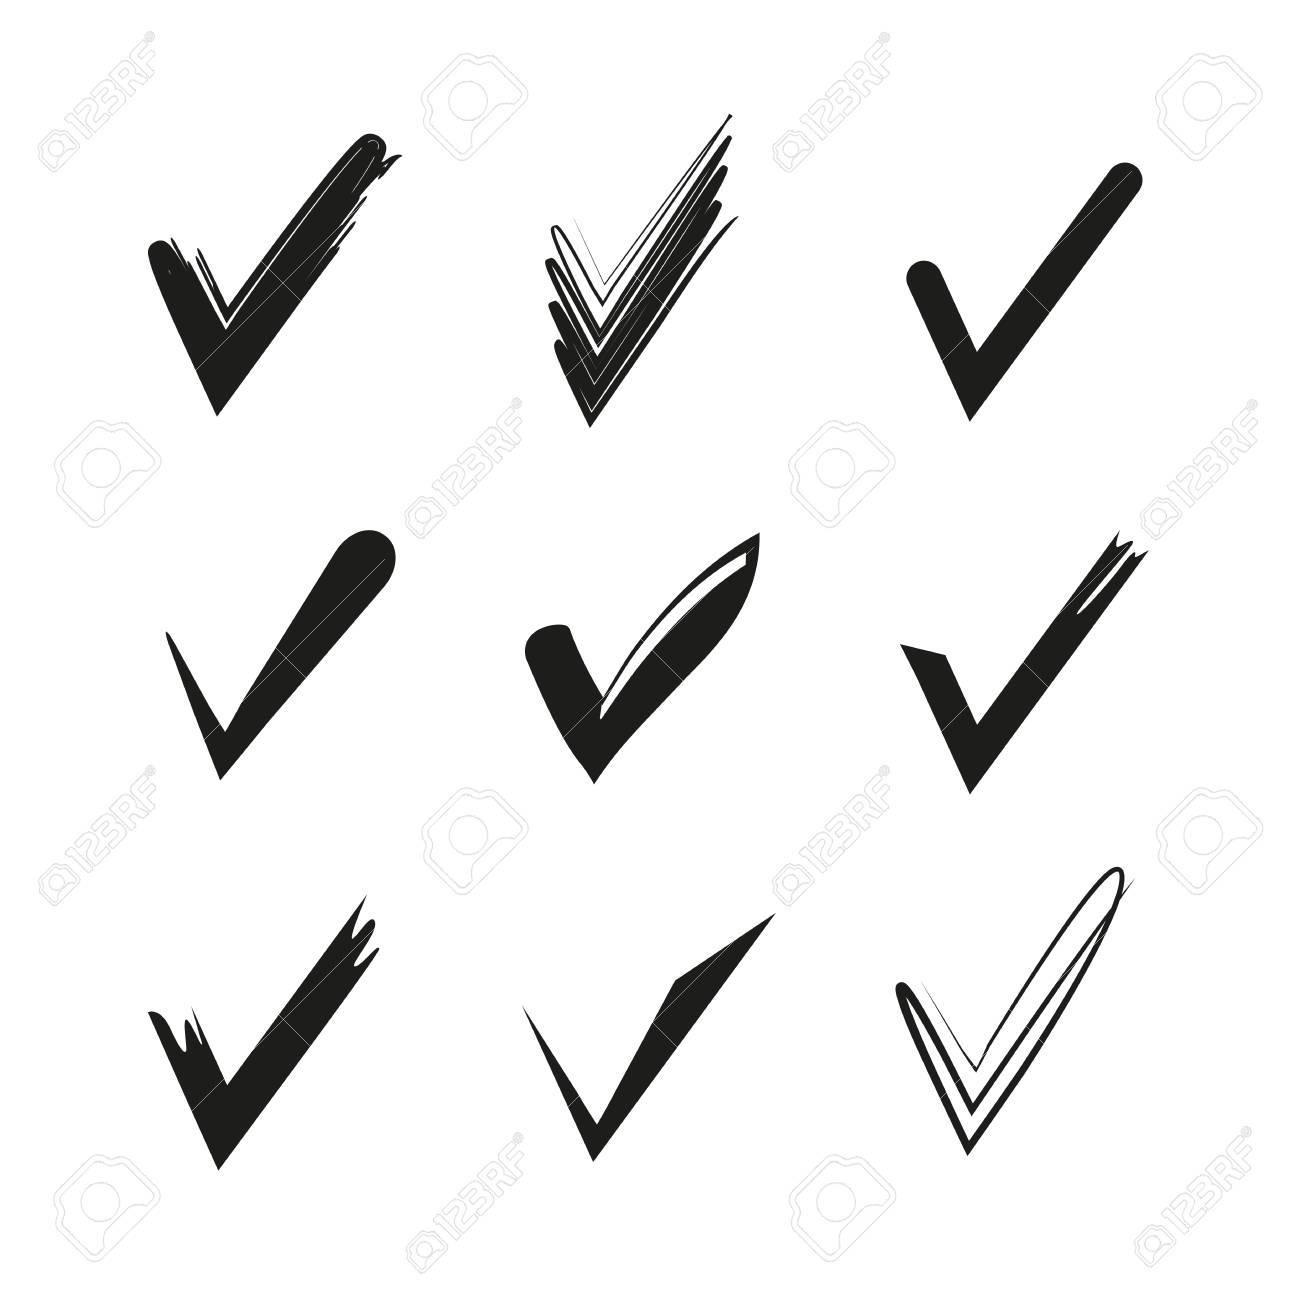 Check Mark Symbols Royalty Free Cliparts Vectors And Stock